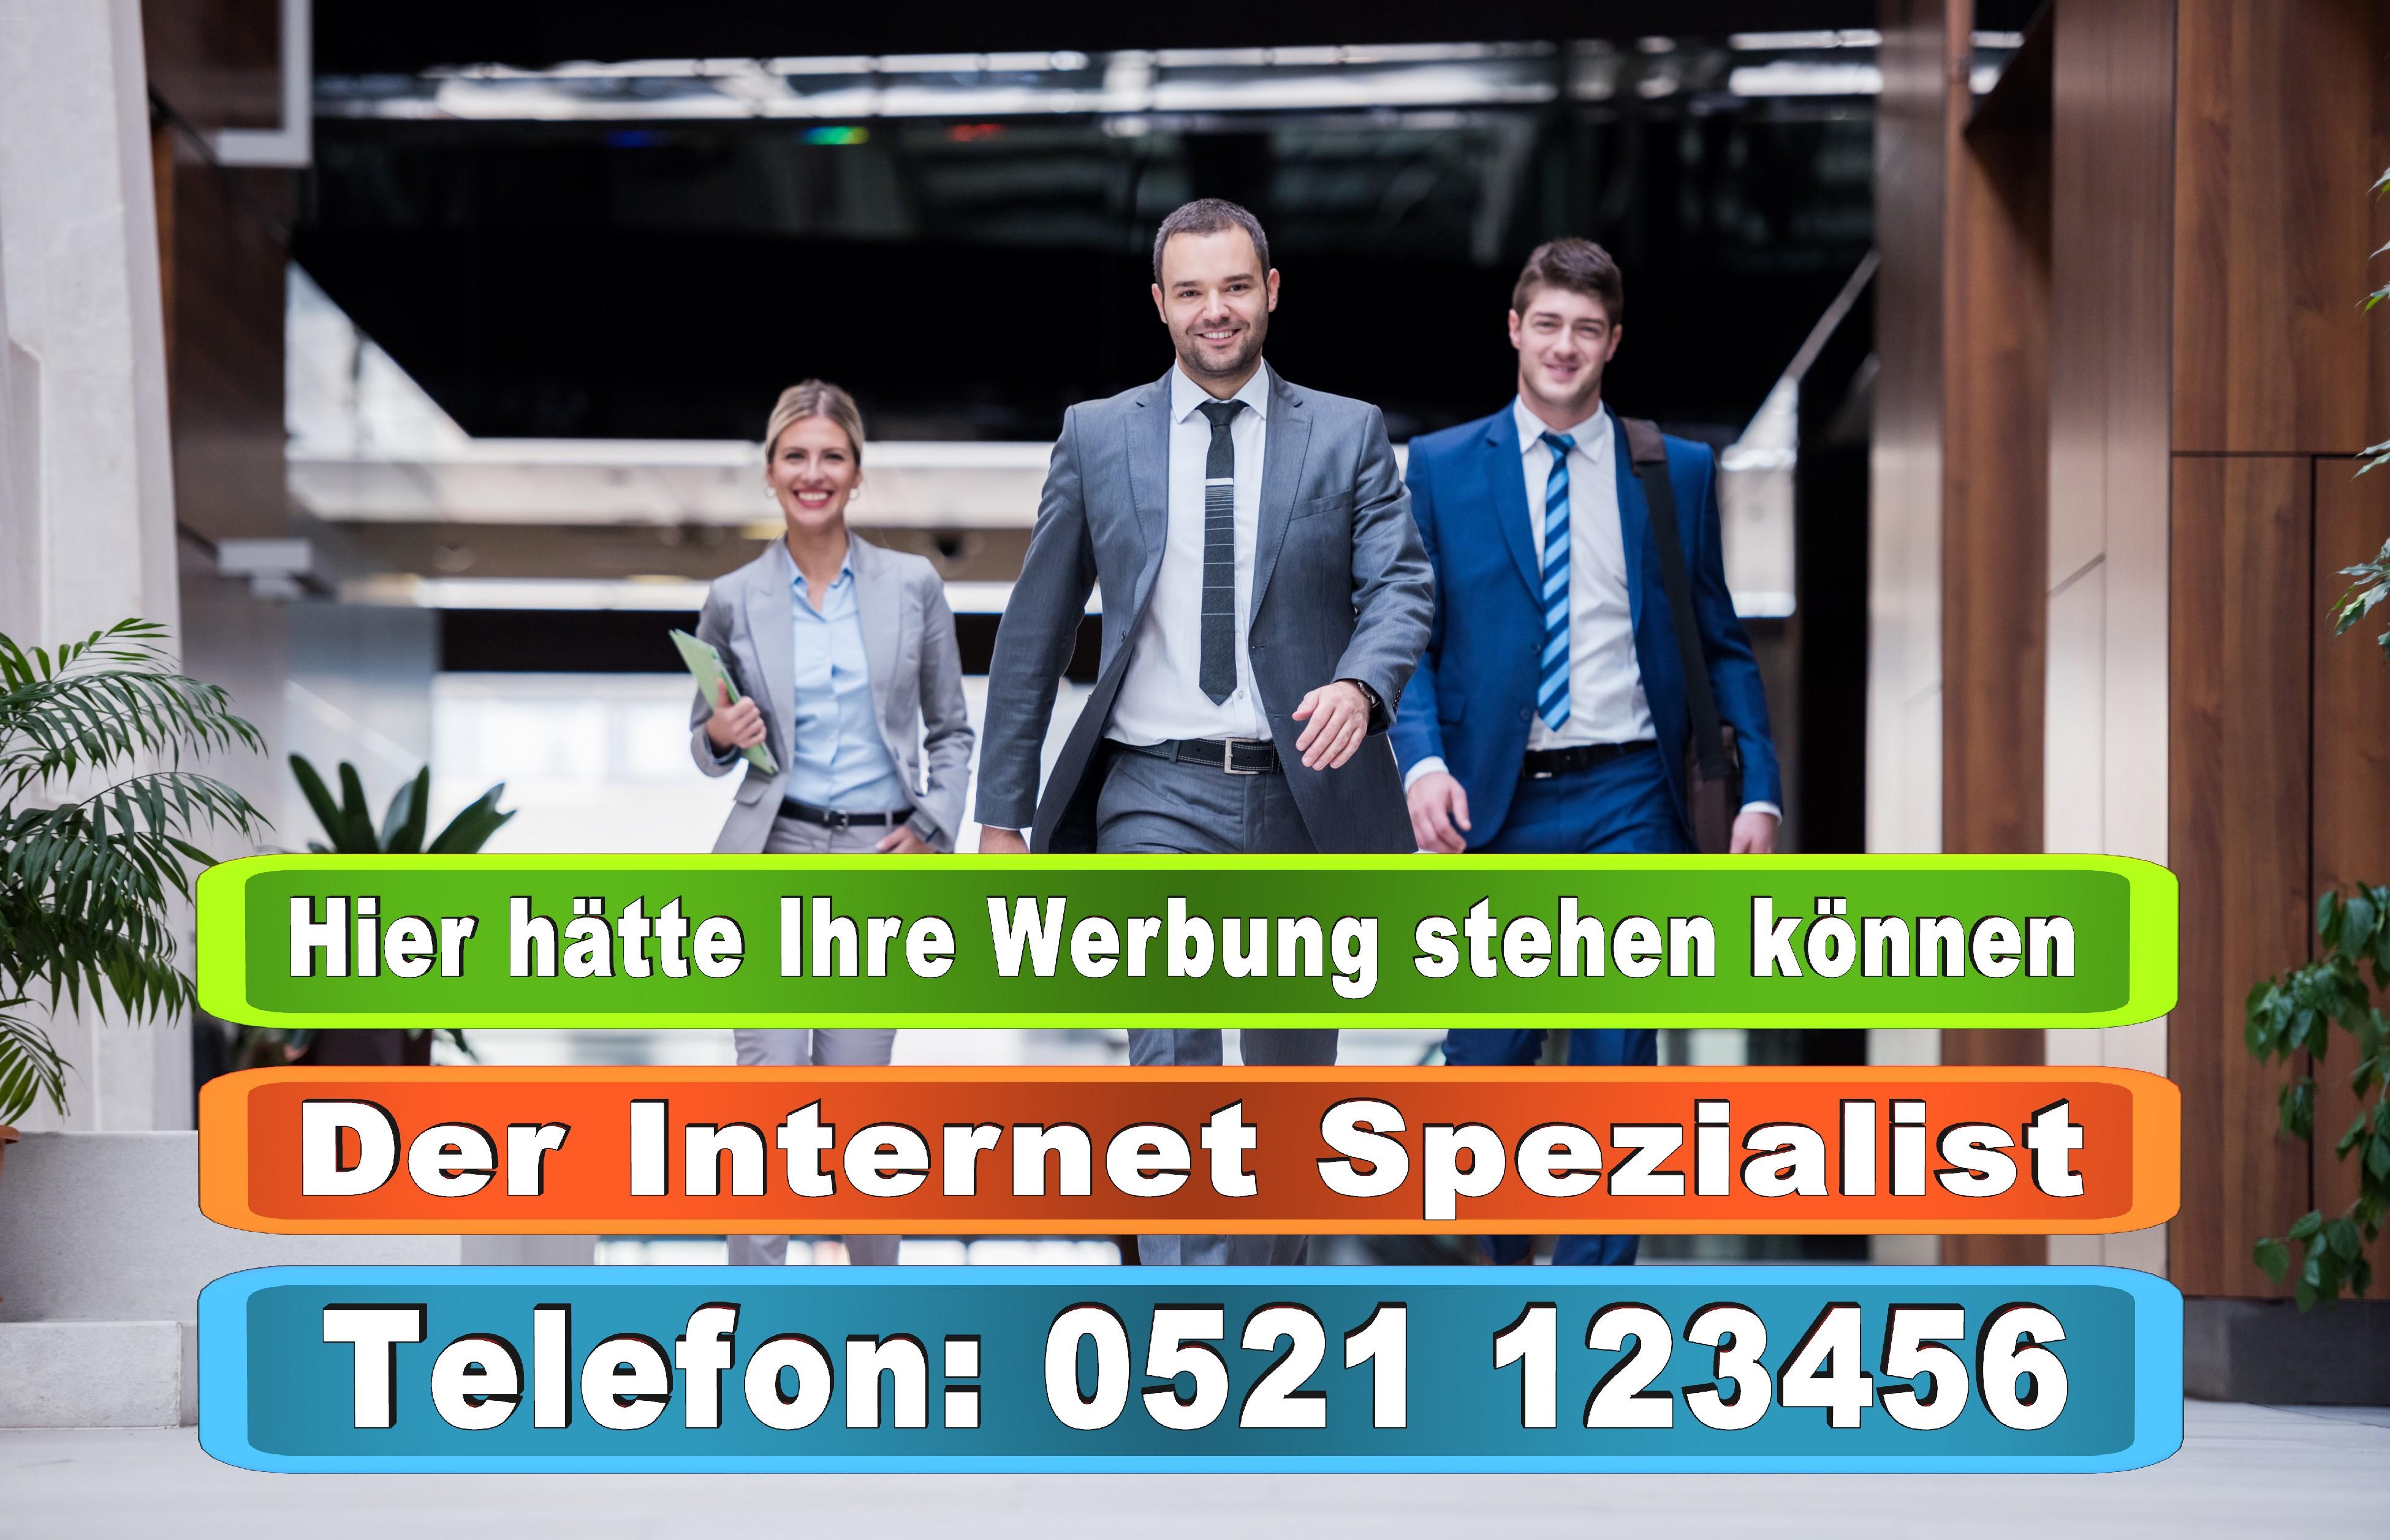 Rechtsanwaltskanzlei Bielefeld NRW OWL Rechtsanwalt Kanzlei Büro Steuerberater Bielefeld Architekt Bielefeld (21)